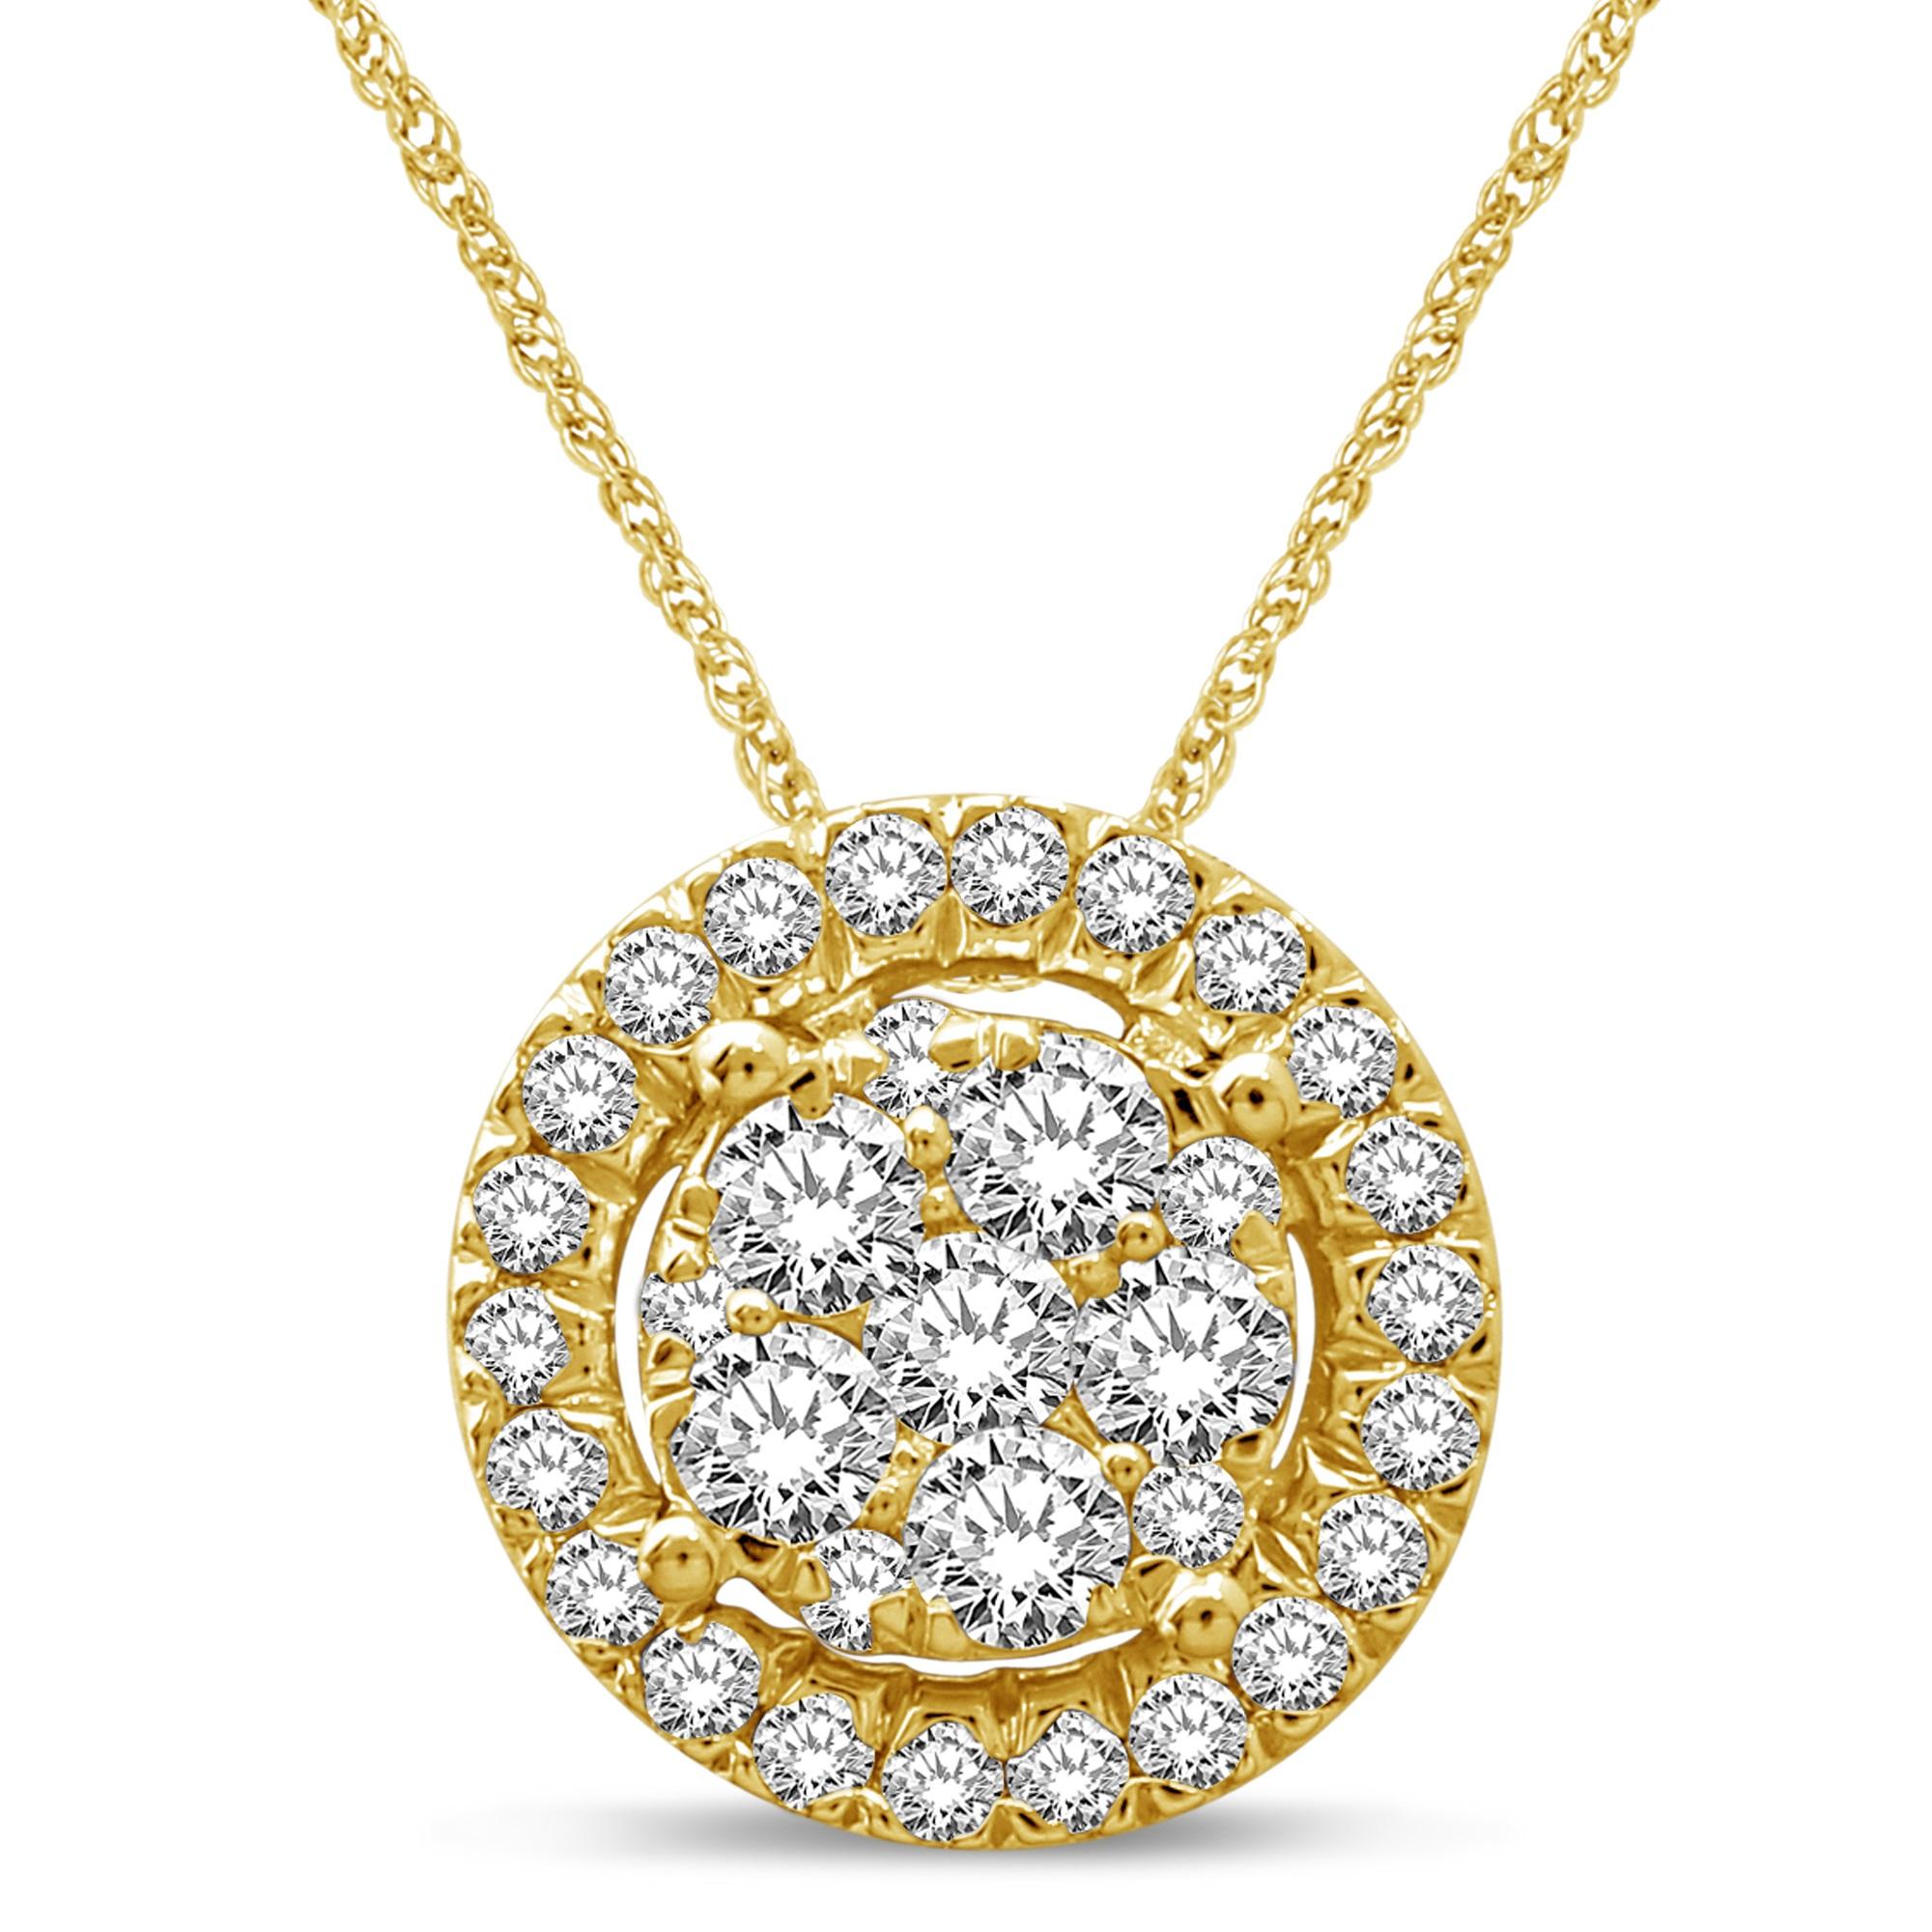 Pendentif  pour femme - Or jaune 14K & Diamants totalisant 0.34 Carat